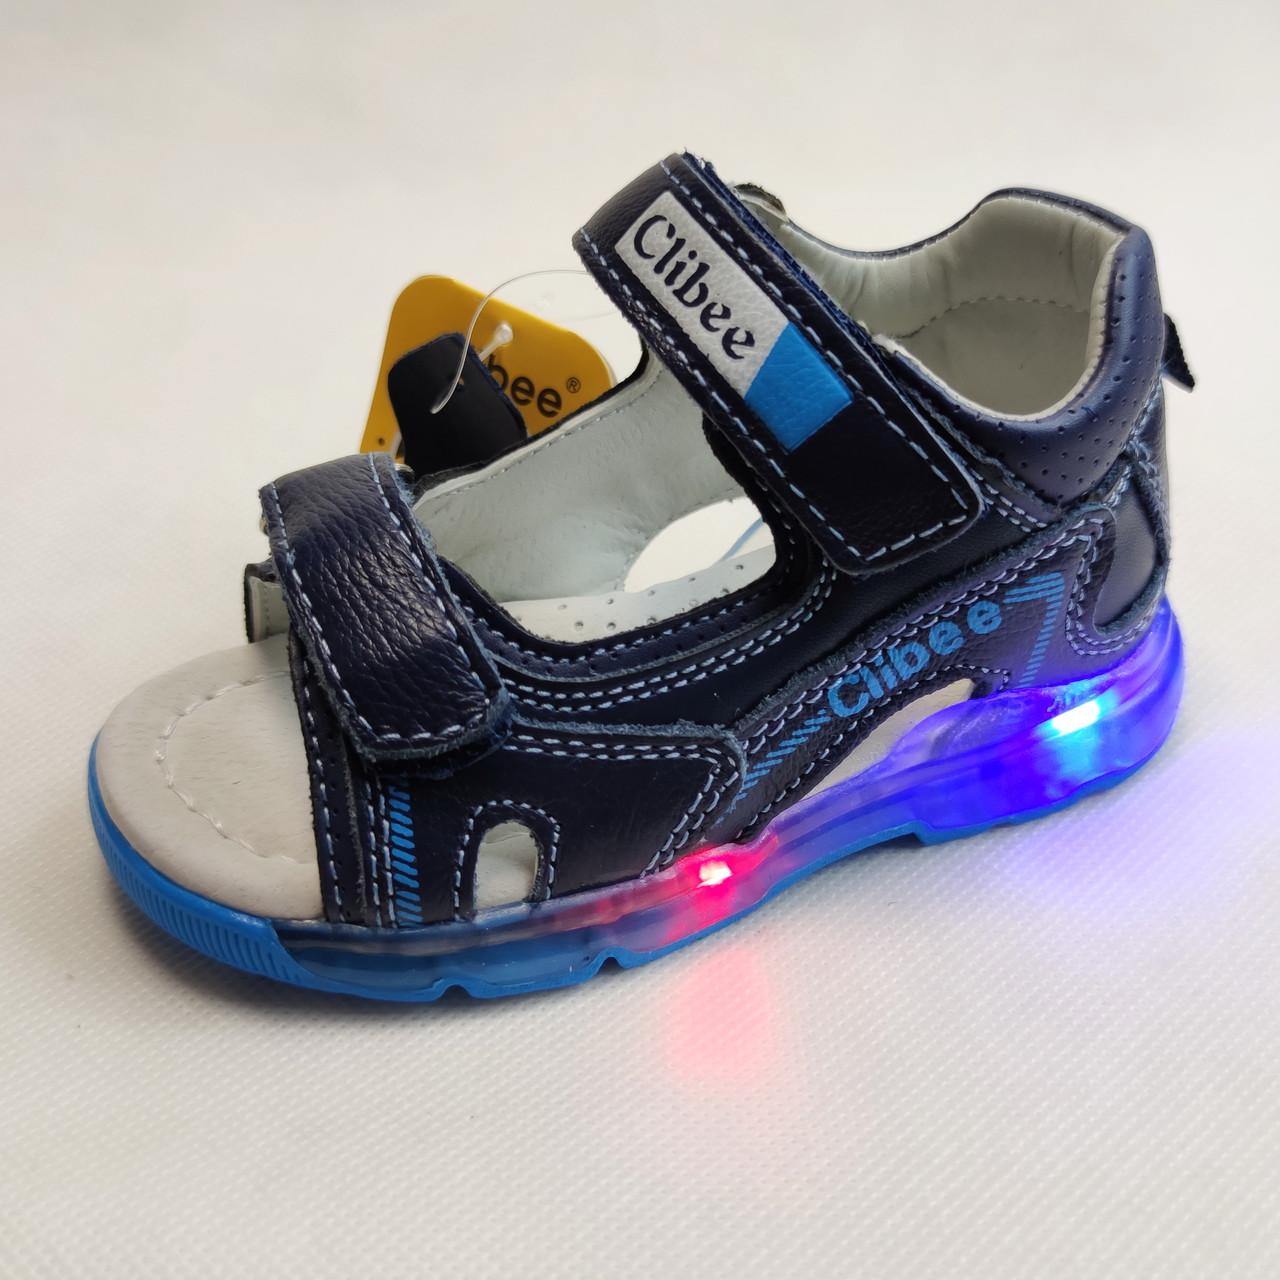 Босоножки, сандалии для мальчика синие Clibee с подсветкой LED